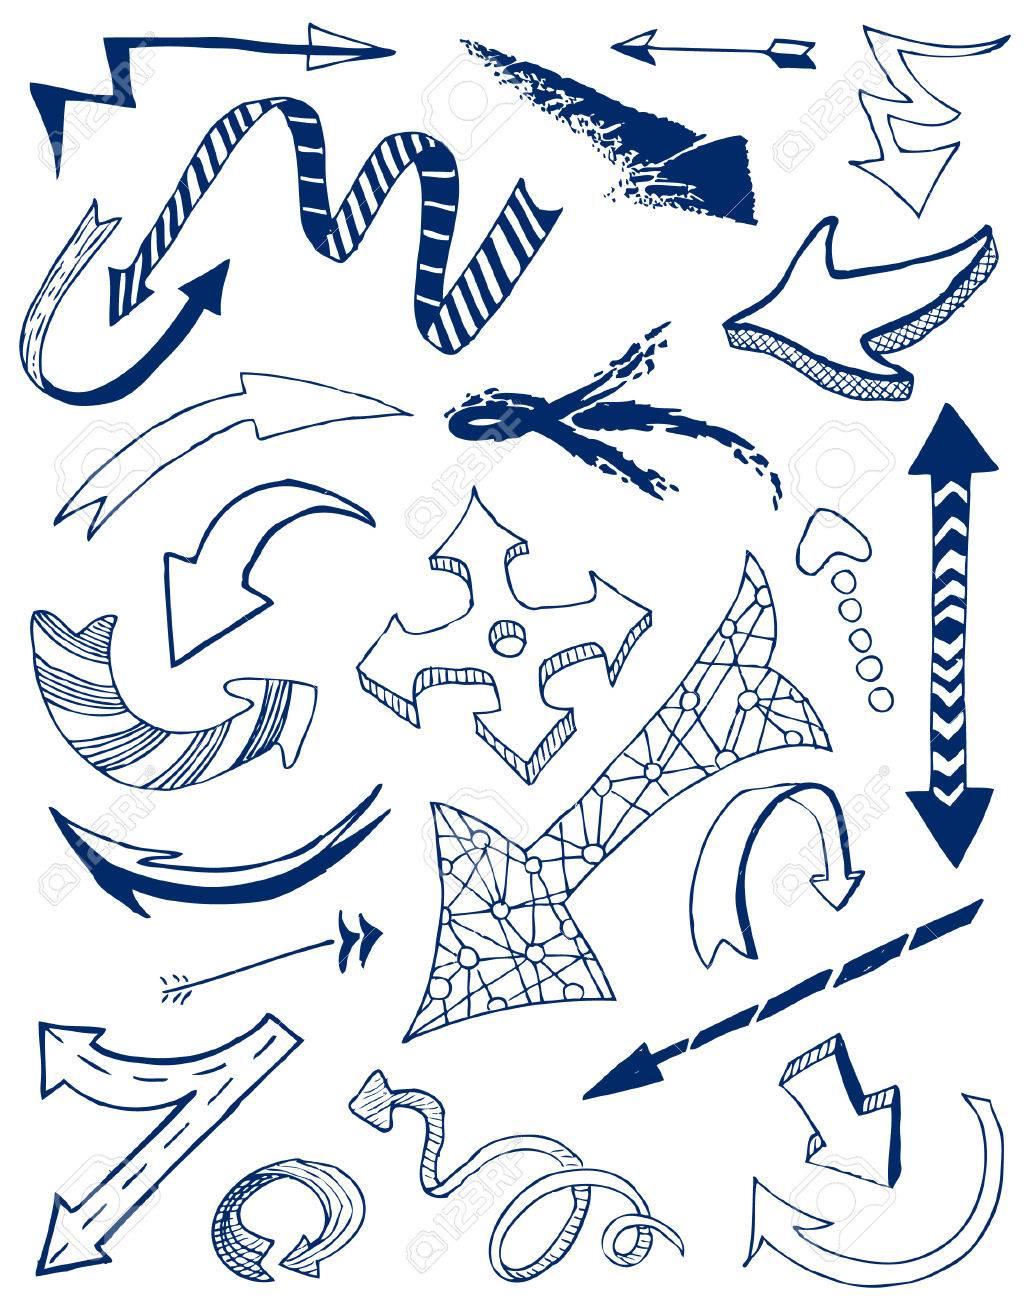 Arrows doodles set. Stock Vector - 7269476